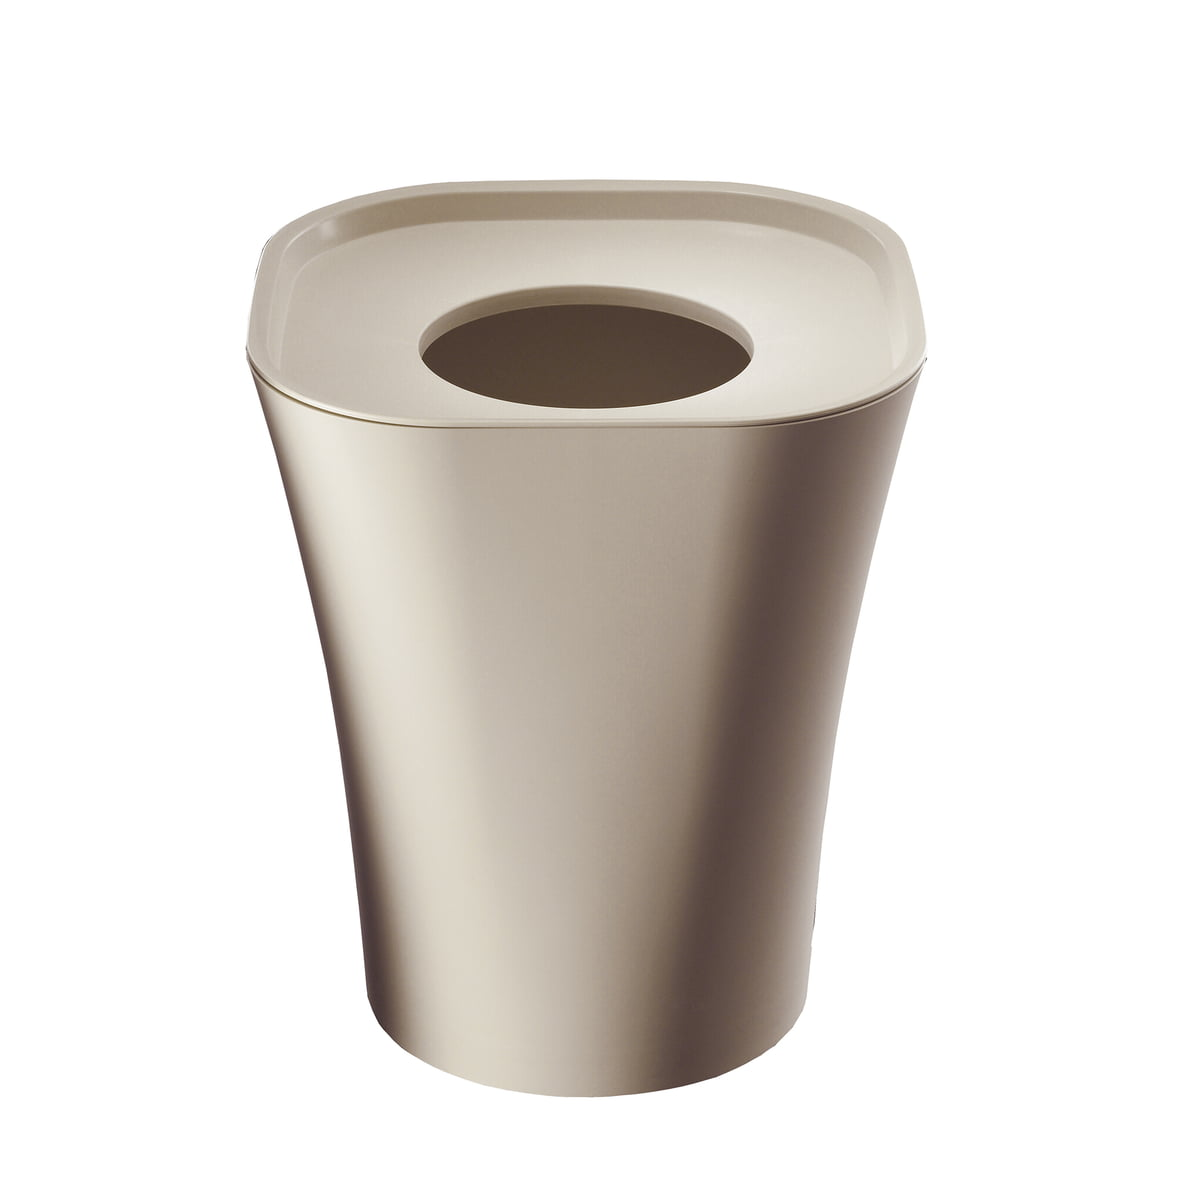 Magis - Trash Papierkorb groß, beige | Büro > Papierkörbe | Magis